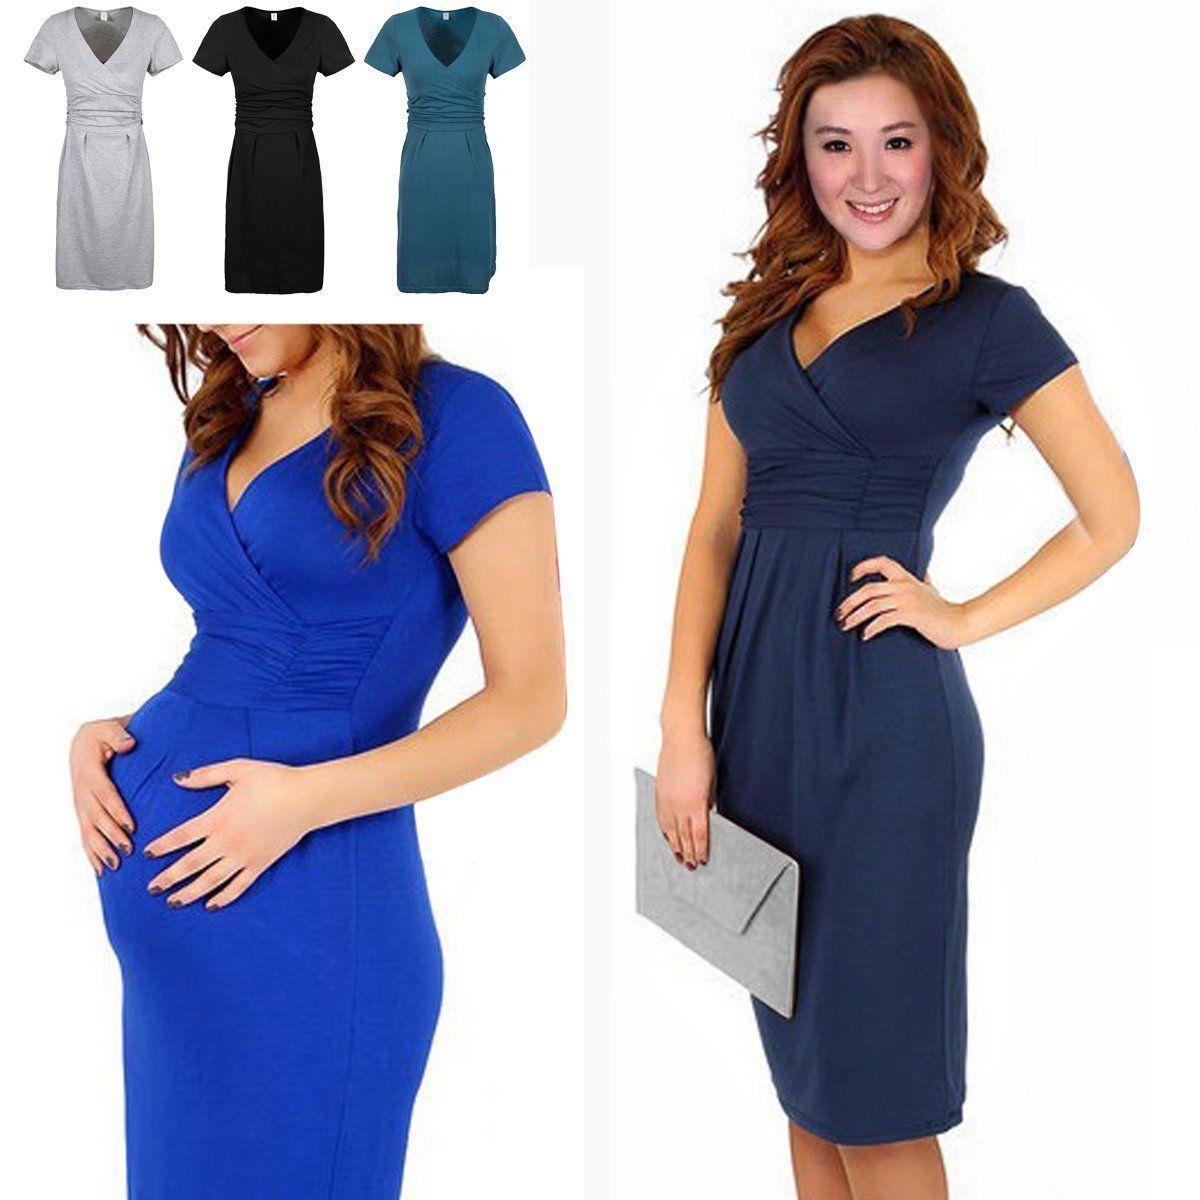 Pregnant fashion women maternity short sleeve casual dress cotton